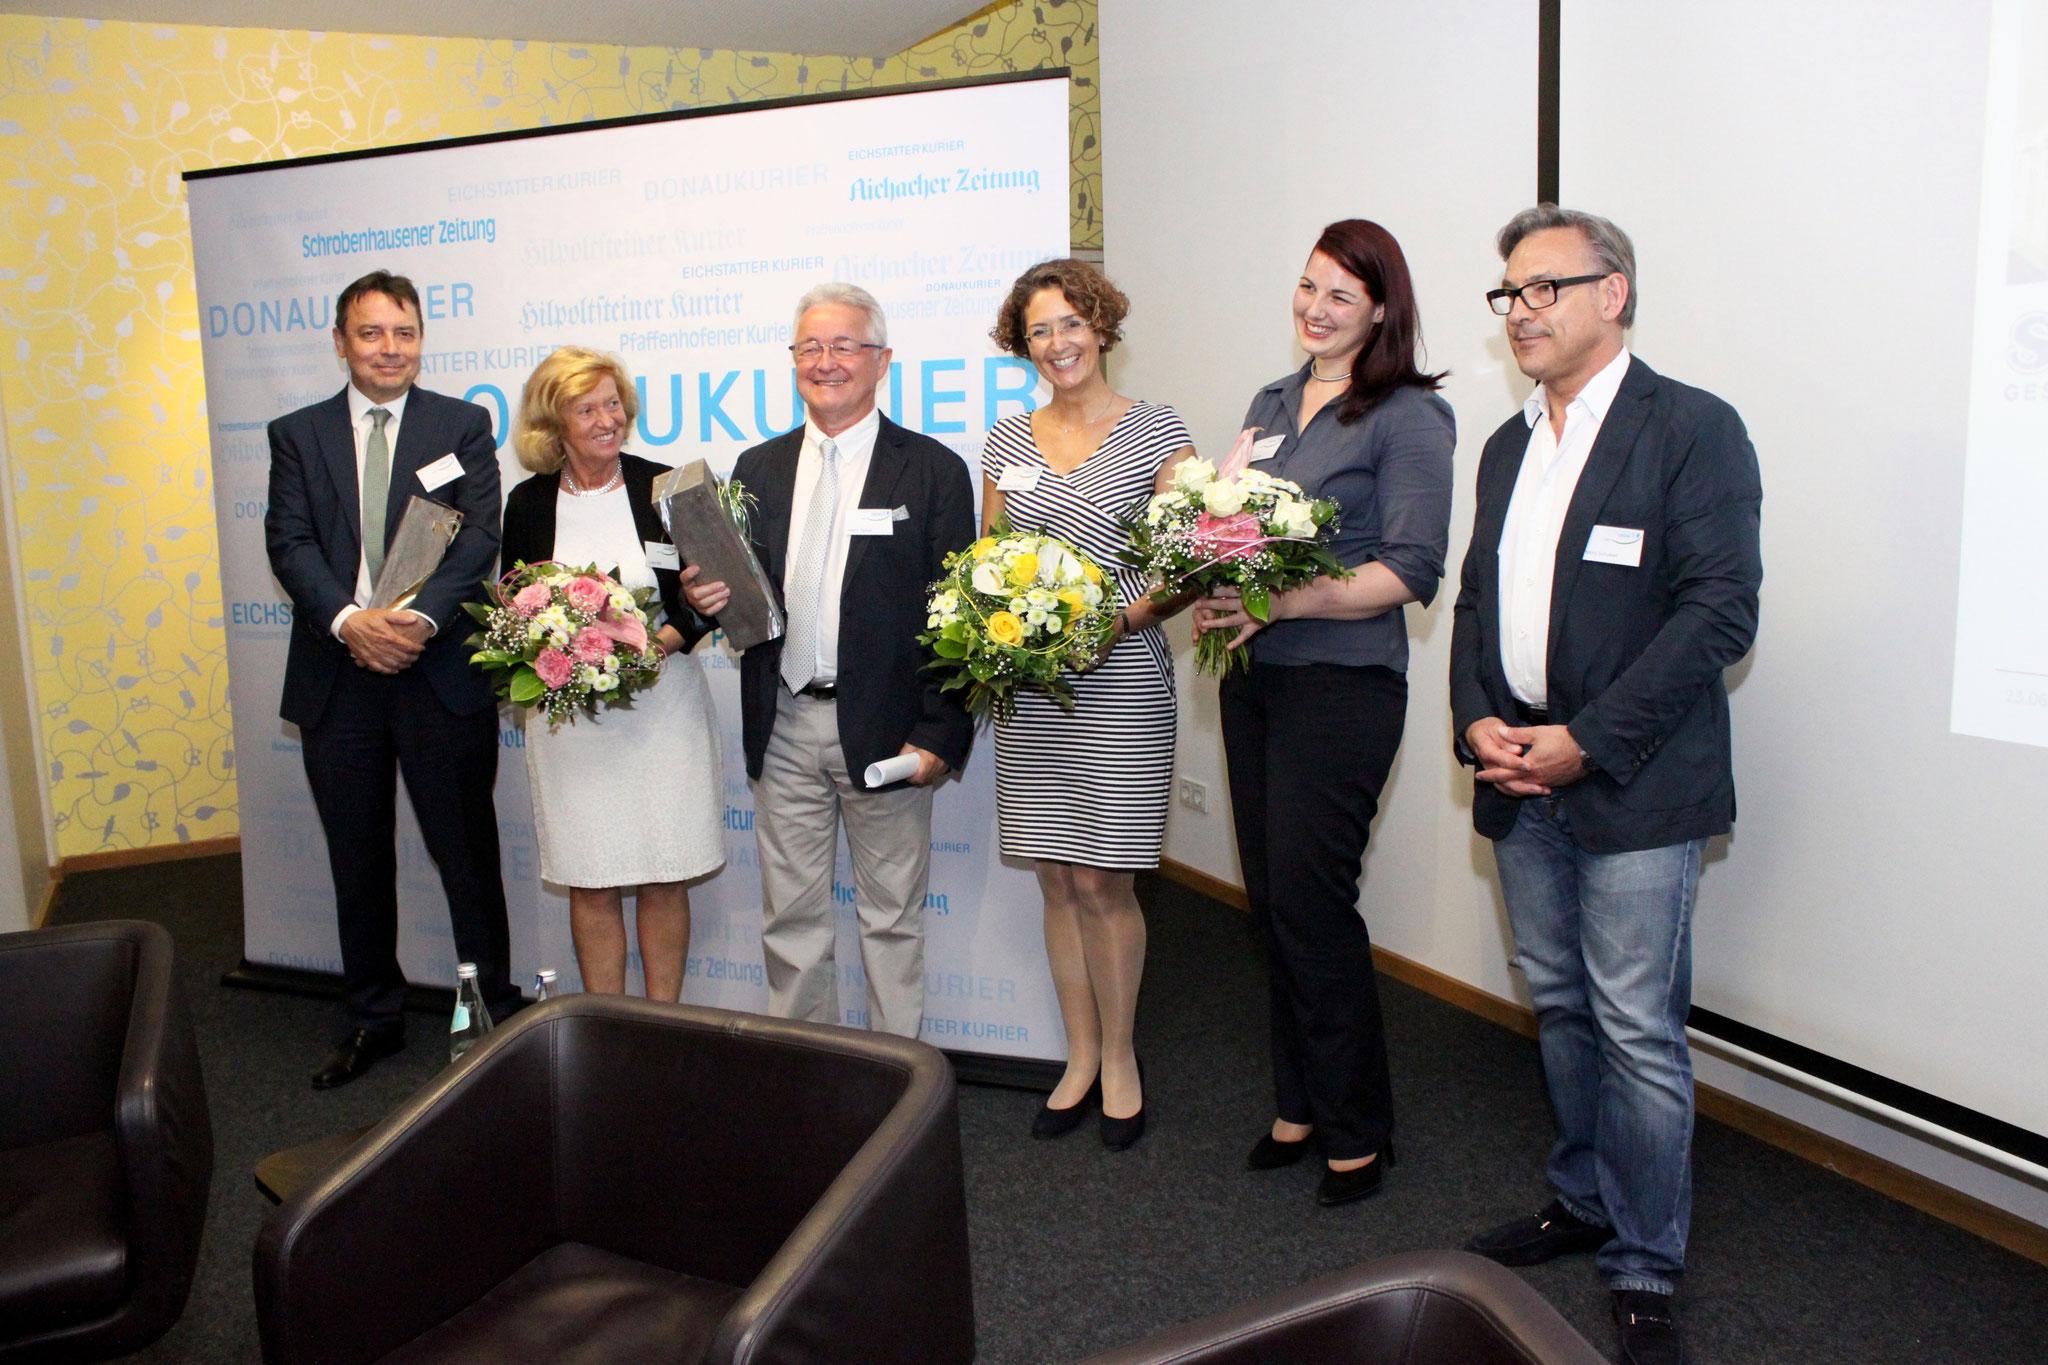 v.l. Walter Hofmann, Lydia Nißl, Heinz Spörer, Dorothea Soffner, Lena Snaider, Henry Schubert